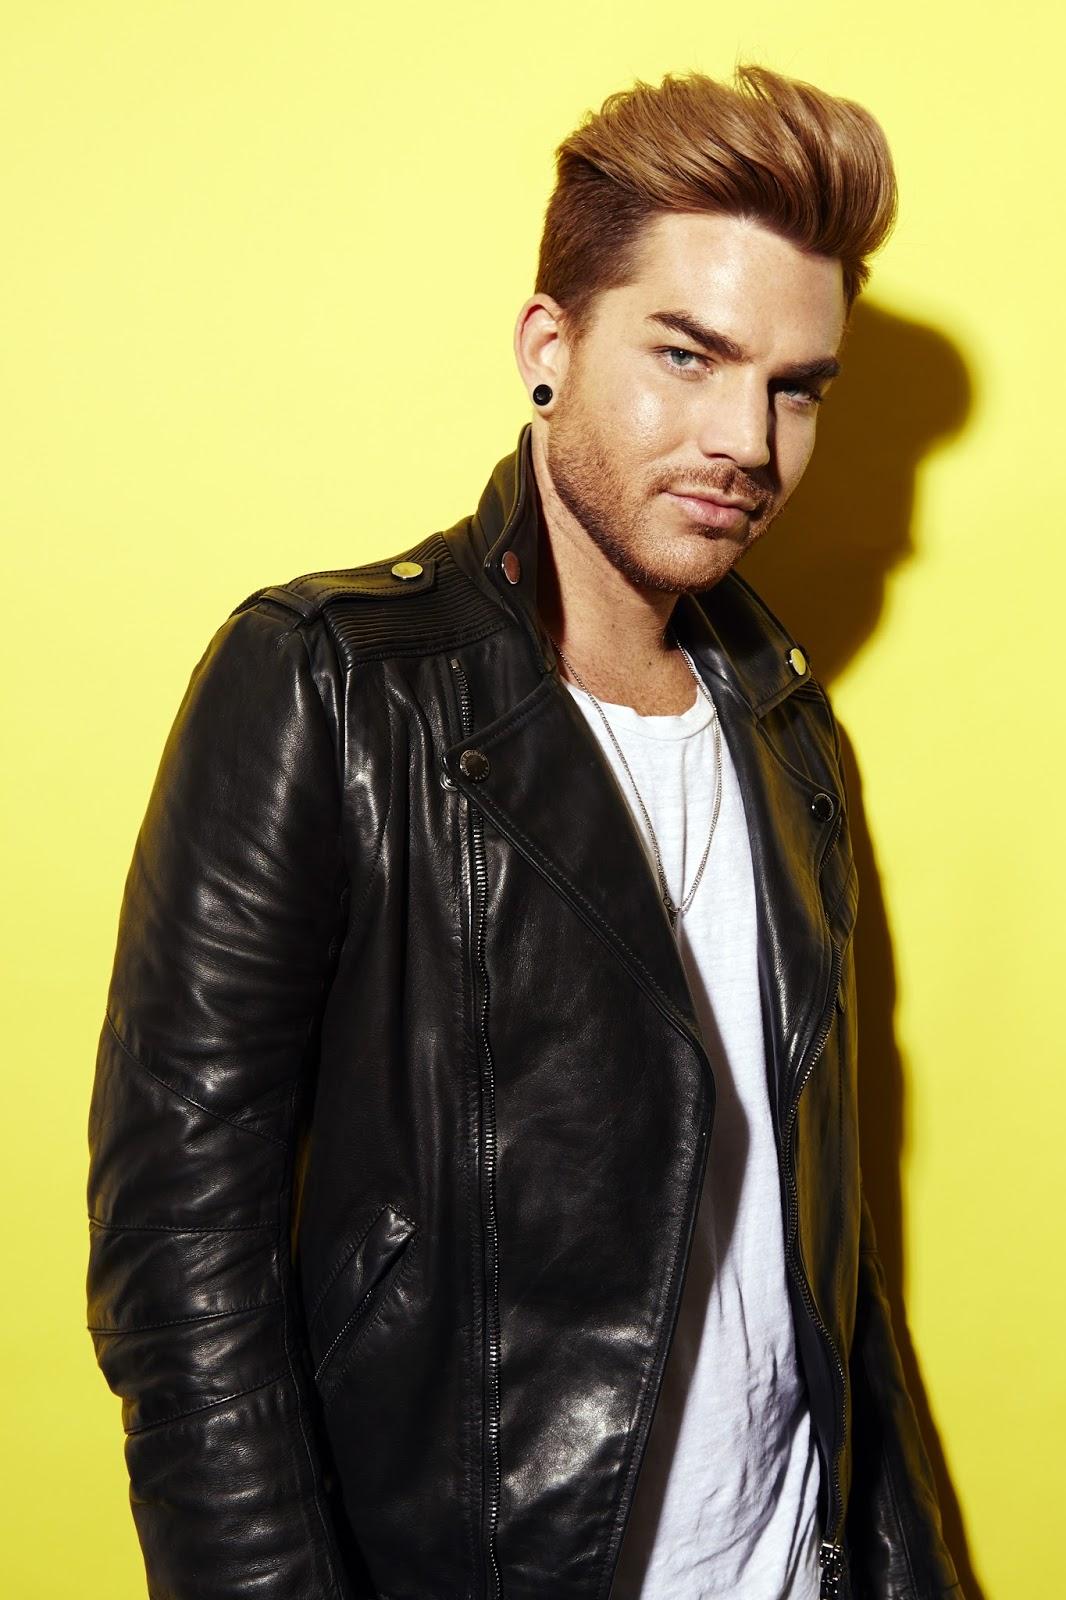 Adam Lambert 2015 Wallpaper